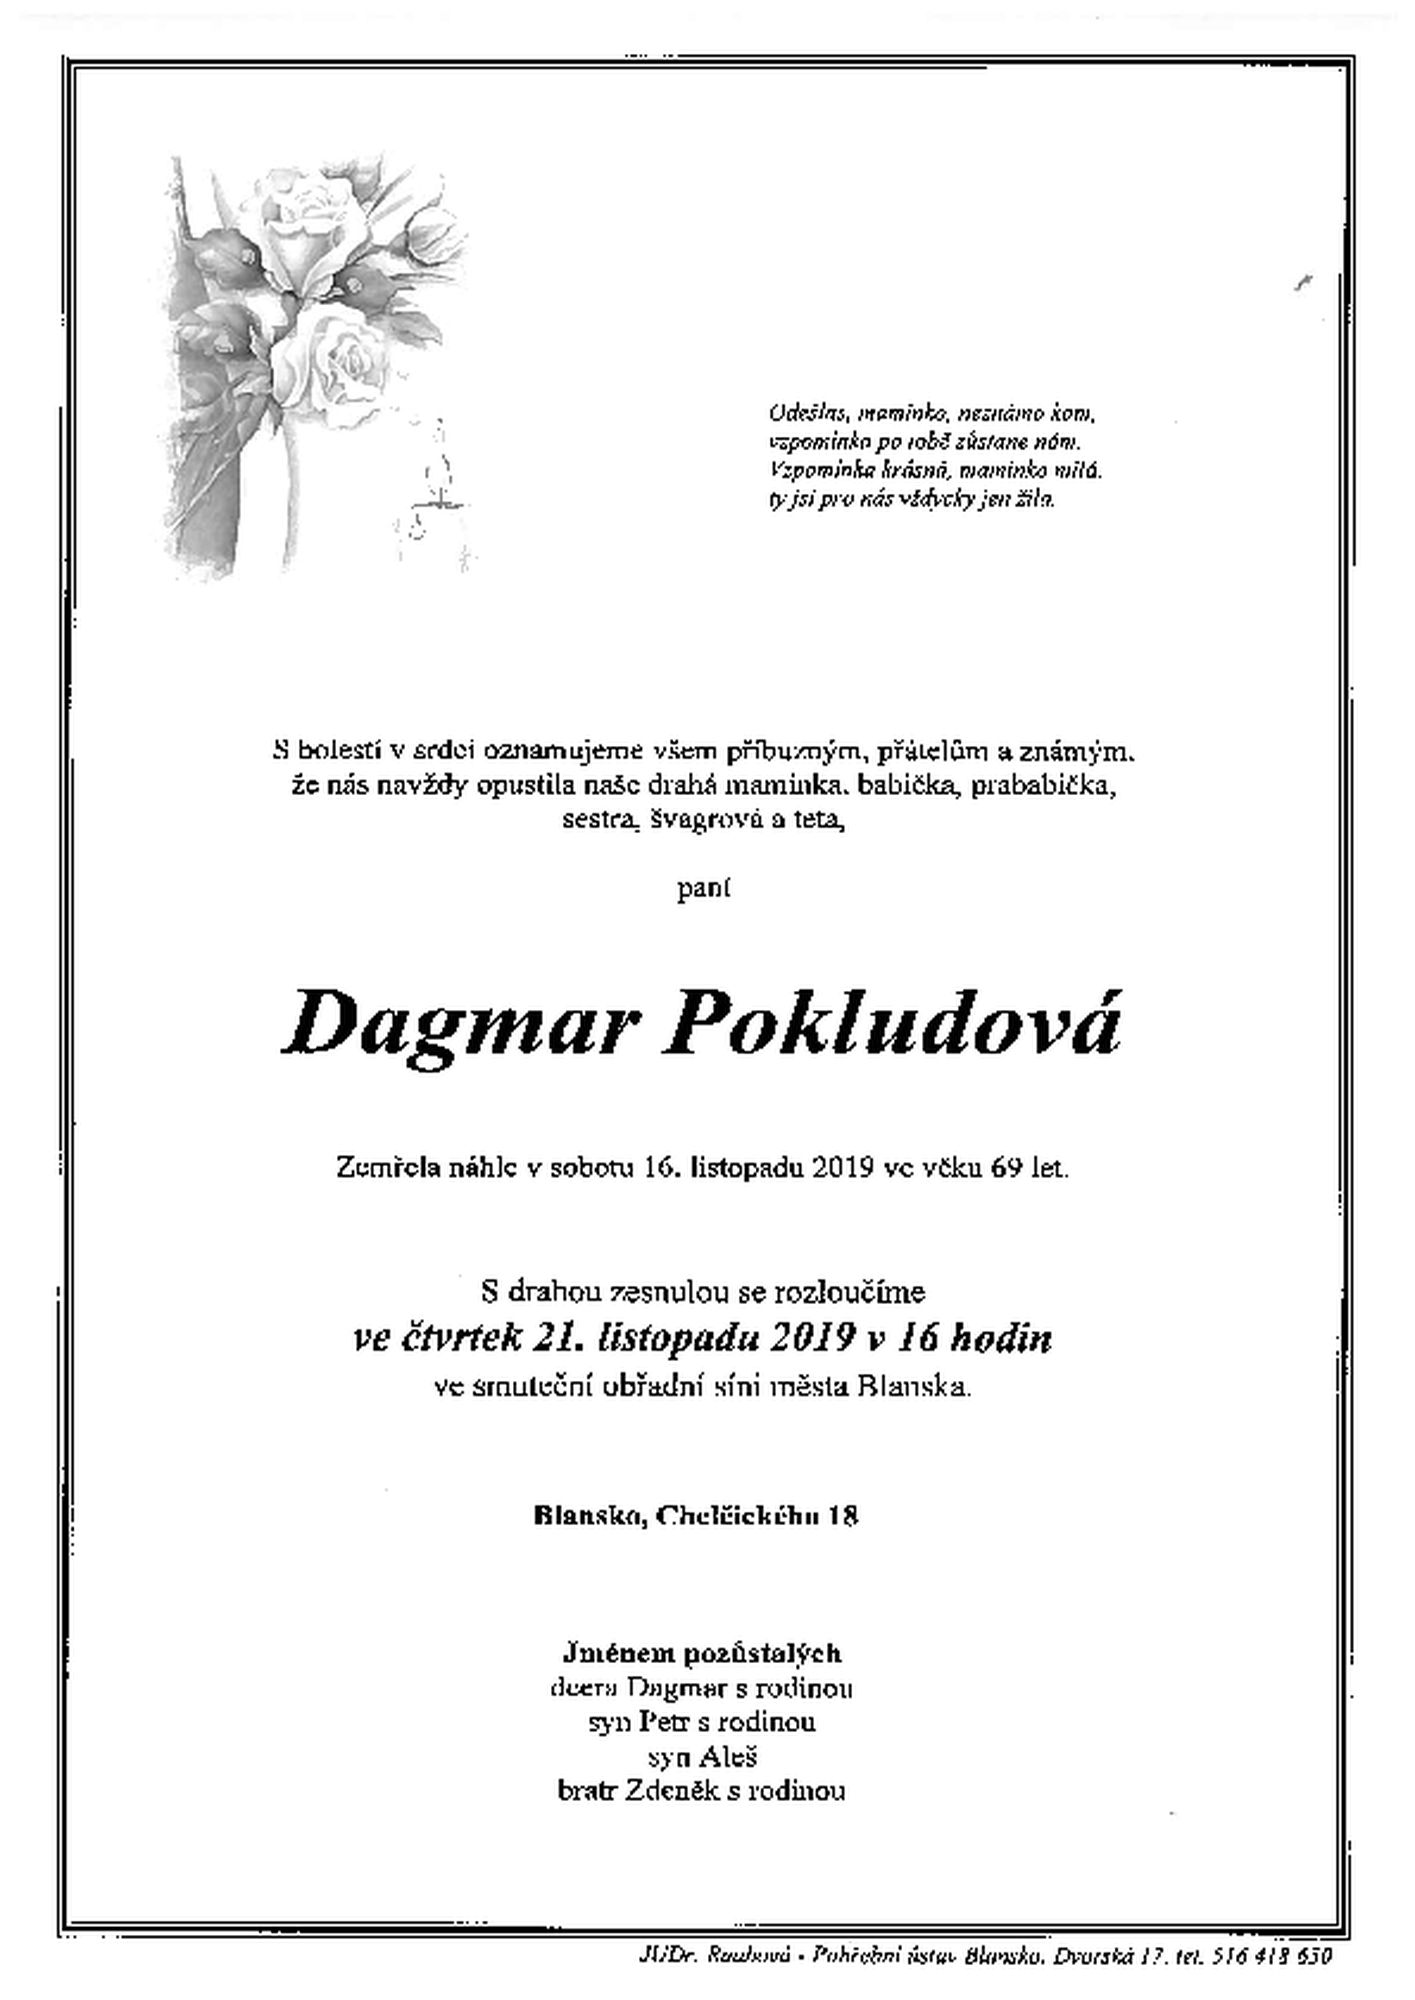 Dagmar Pokludová